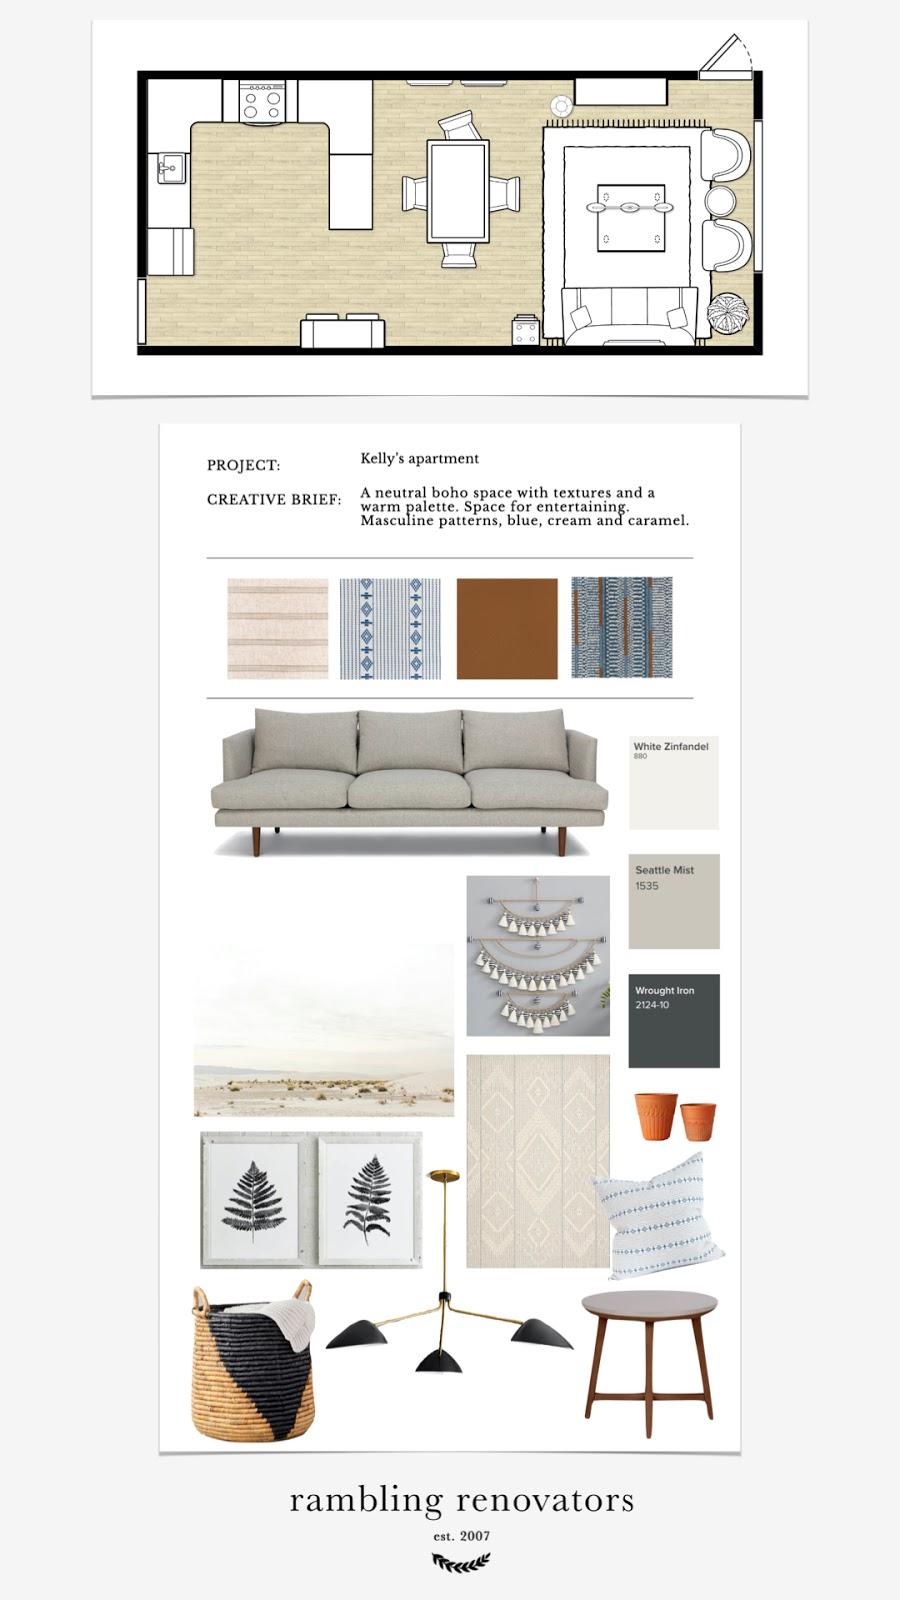 design services online, online edesign, design consultation